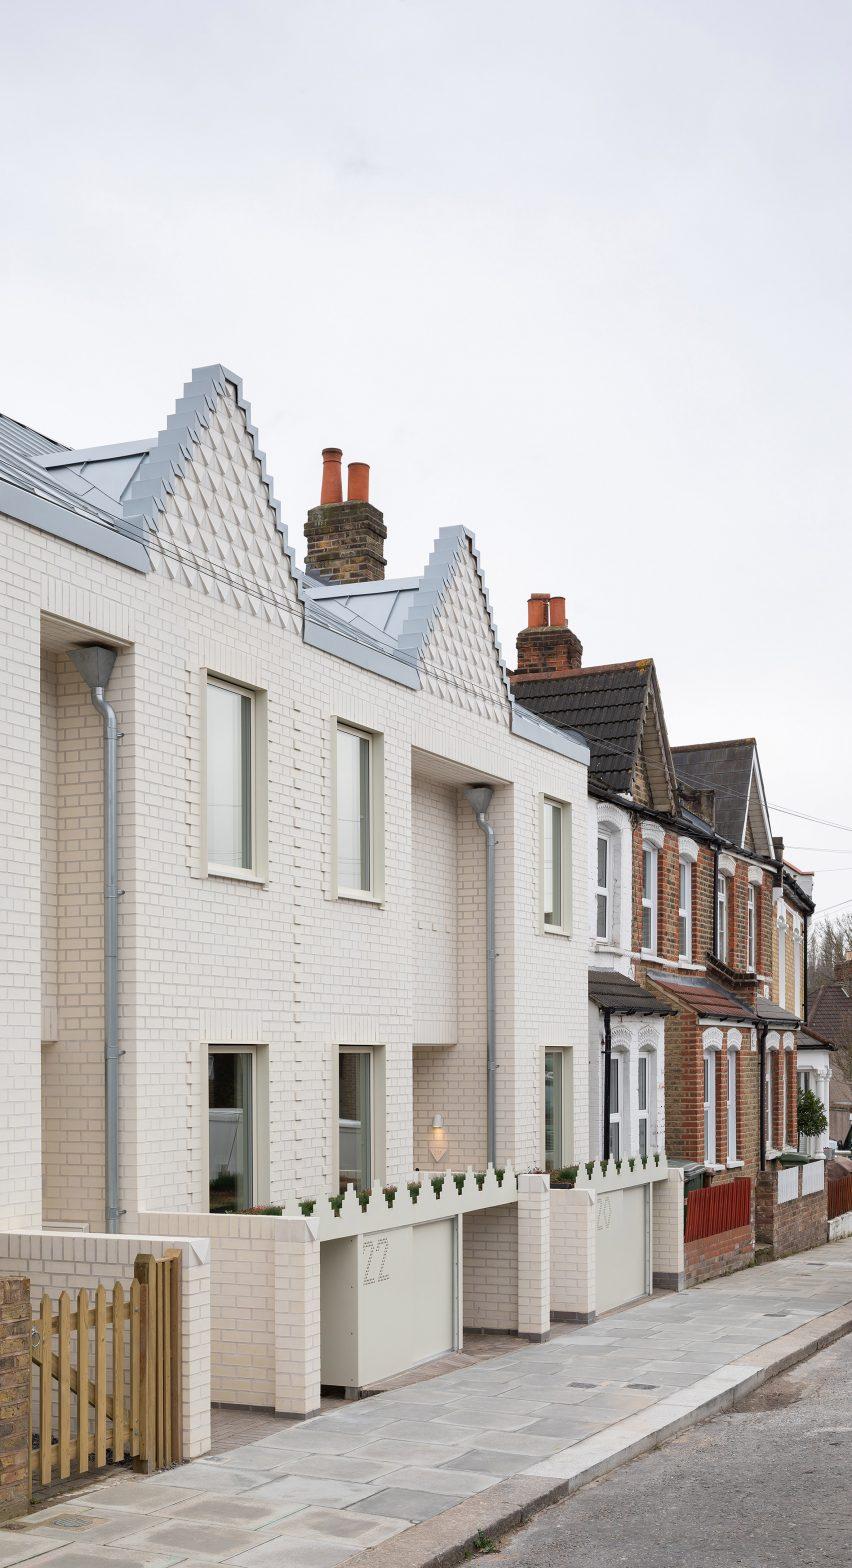 White brick terraced houses in London